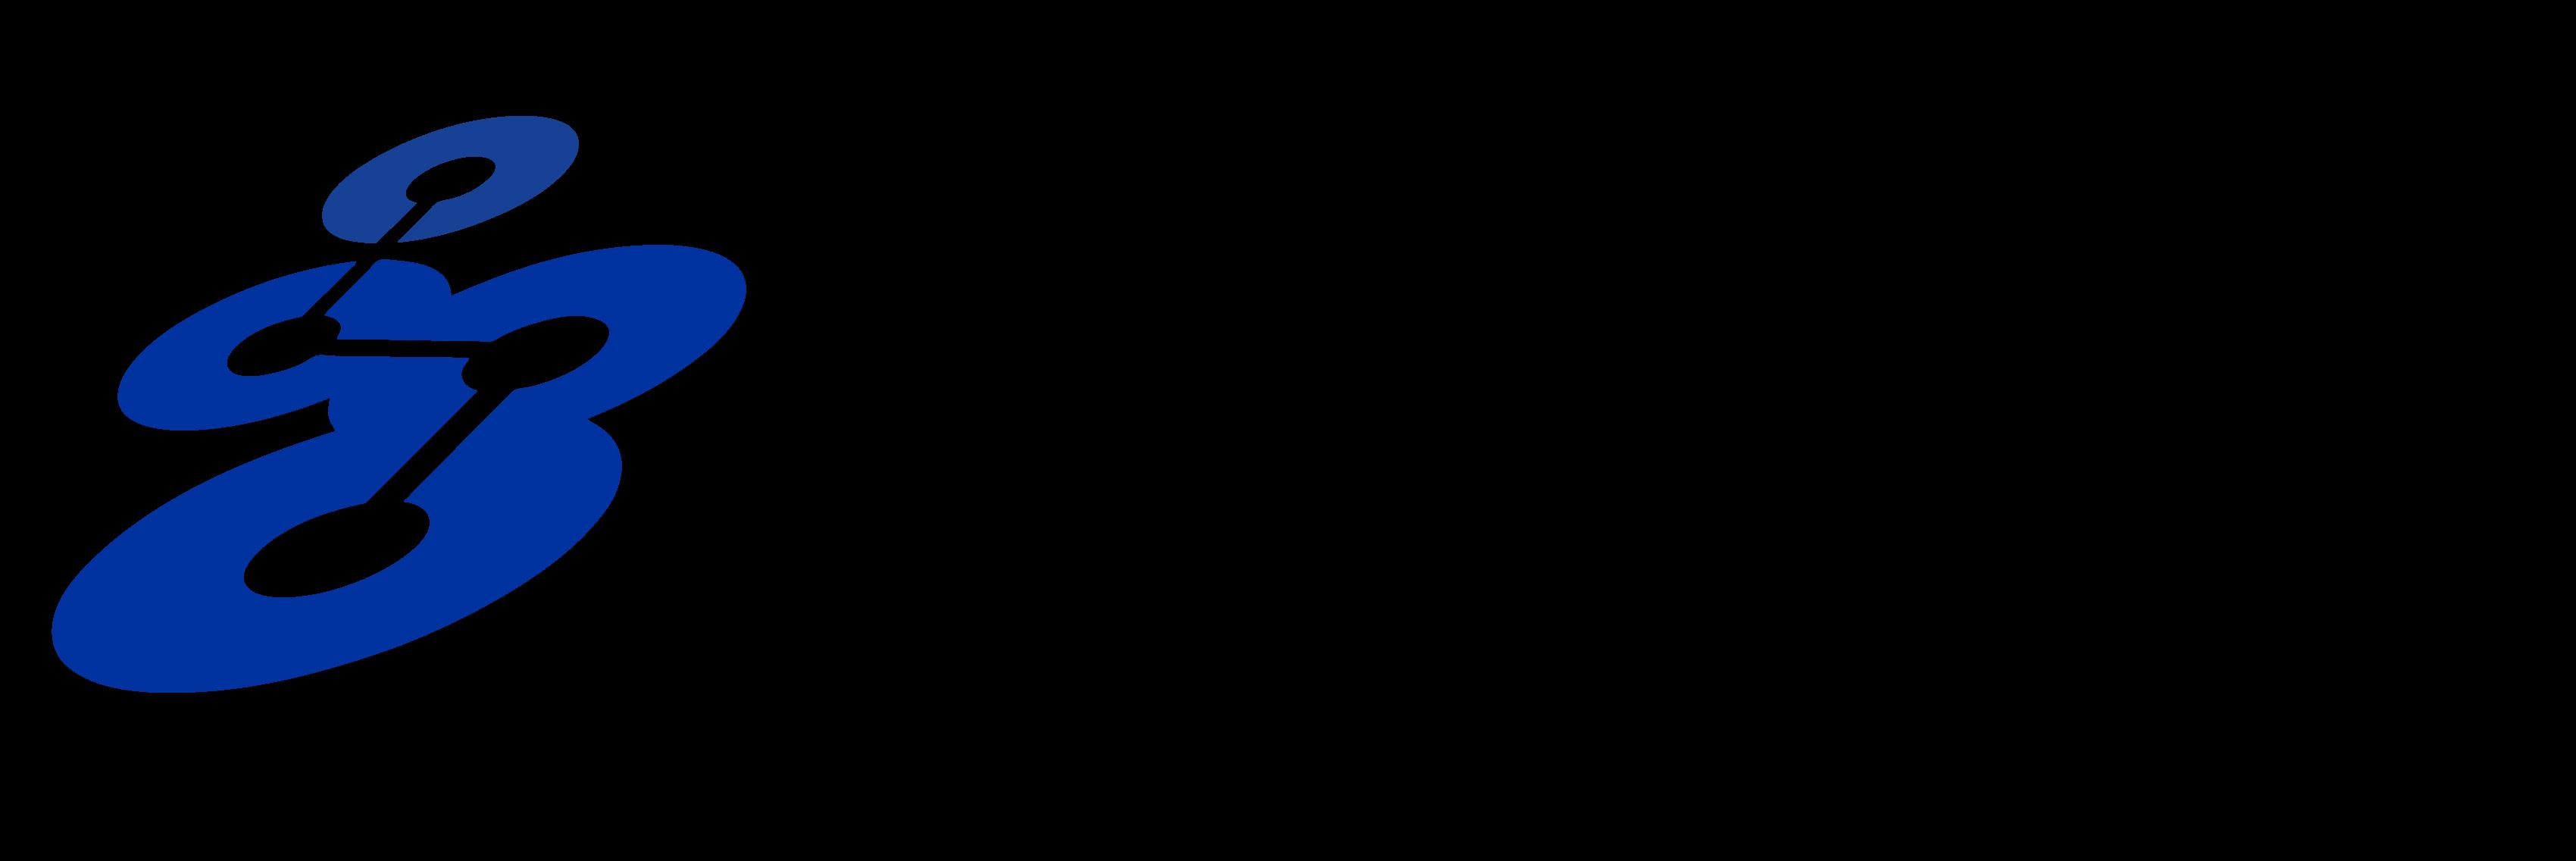 Songwon logo.